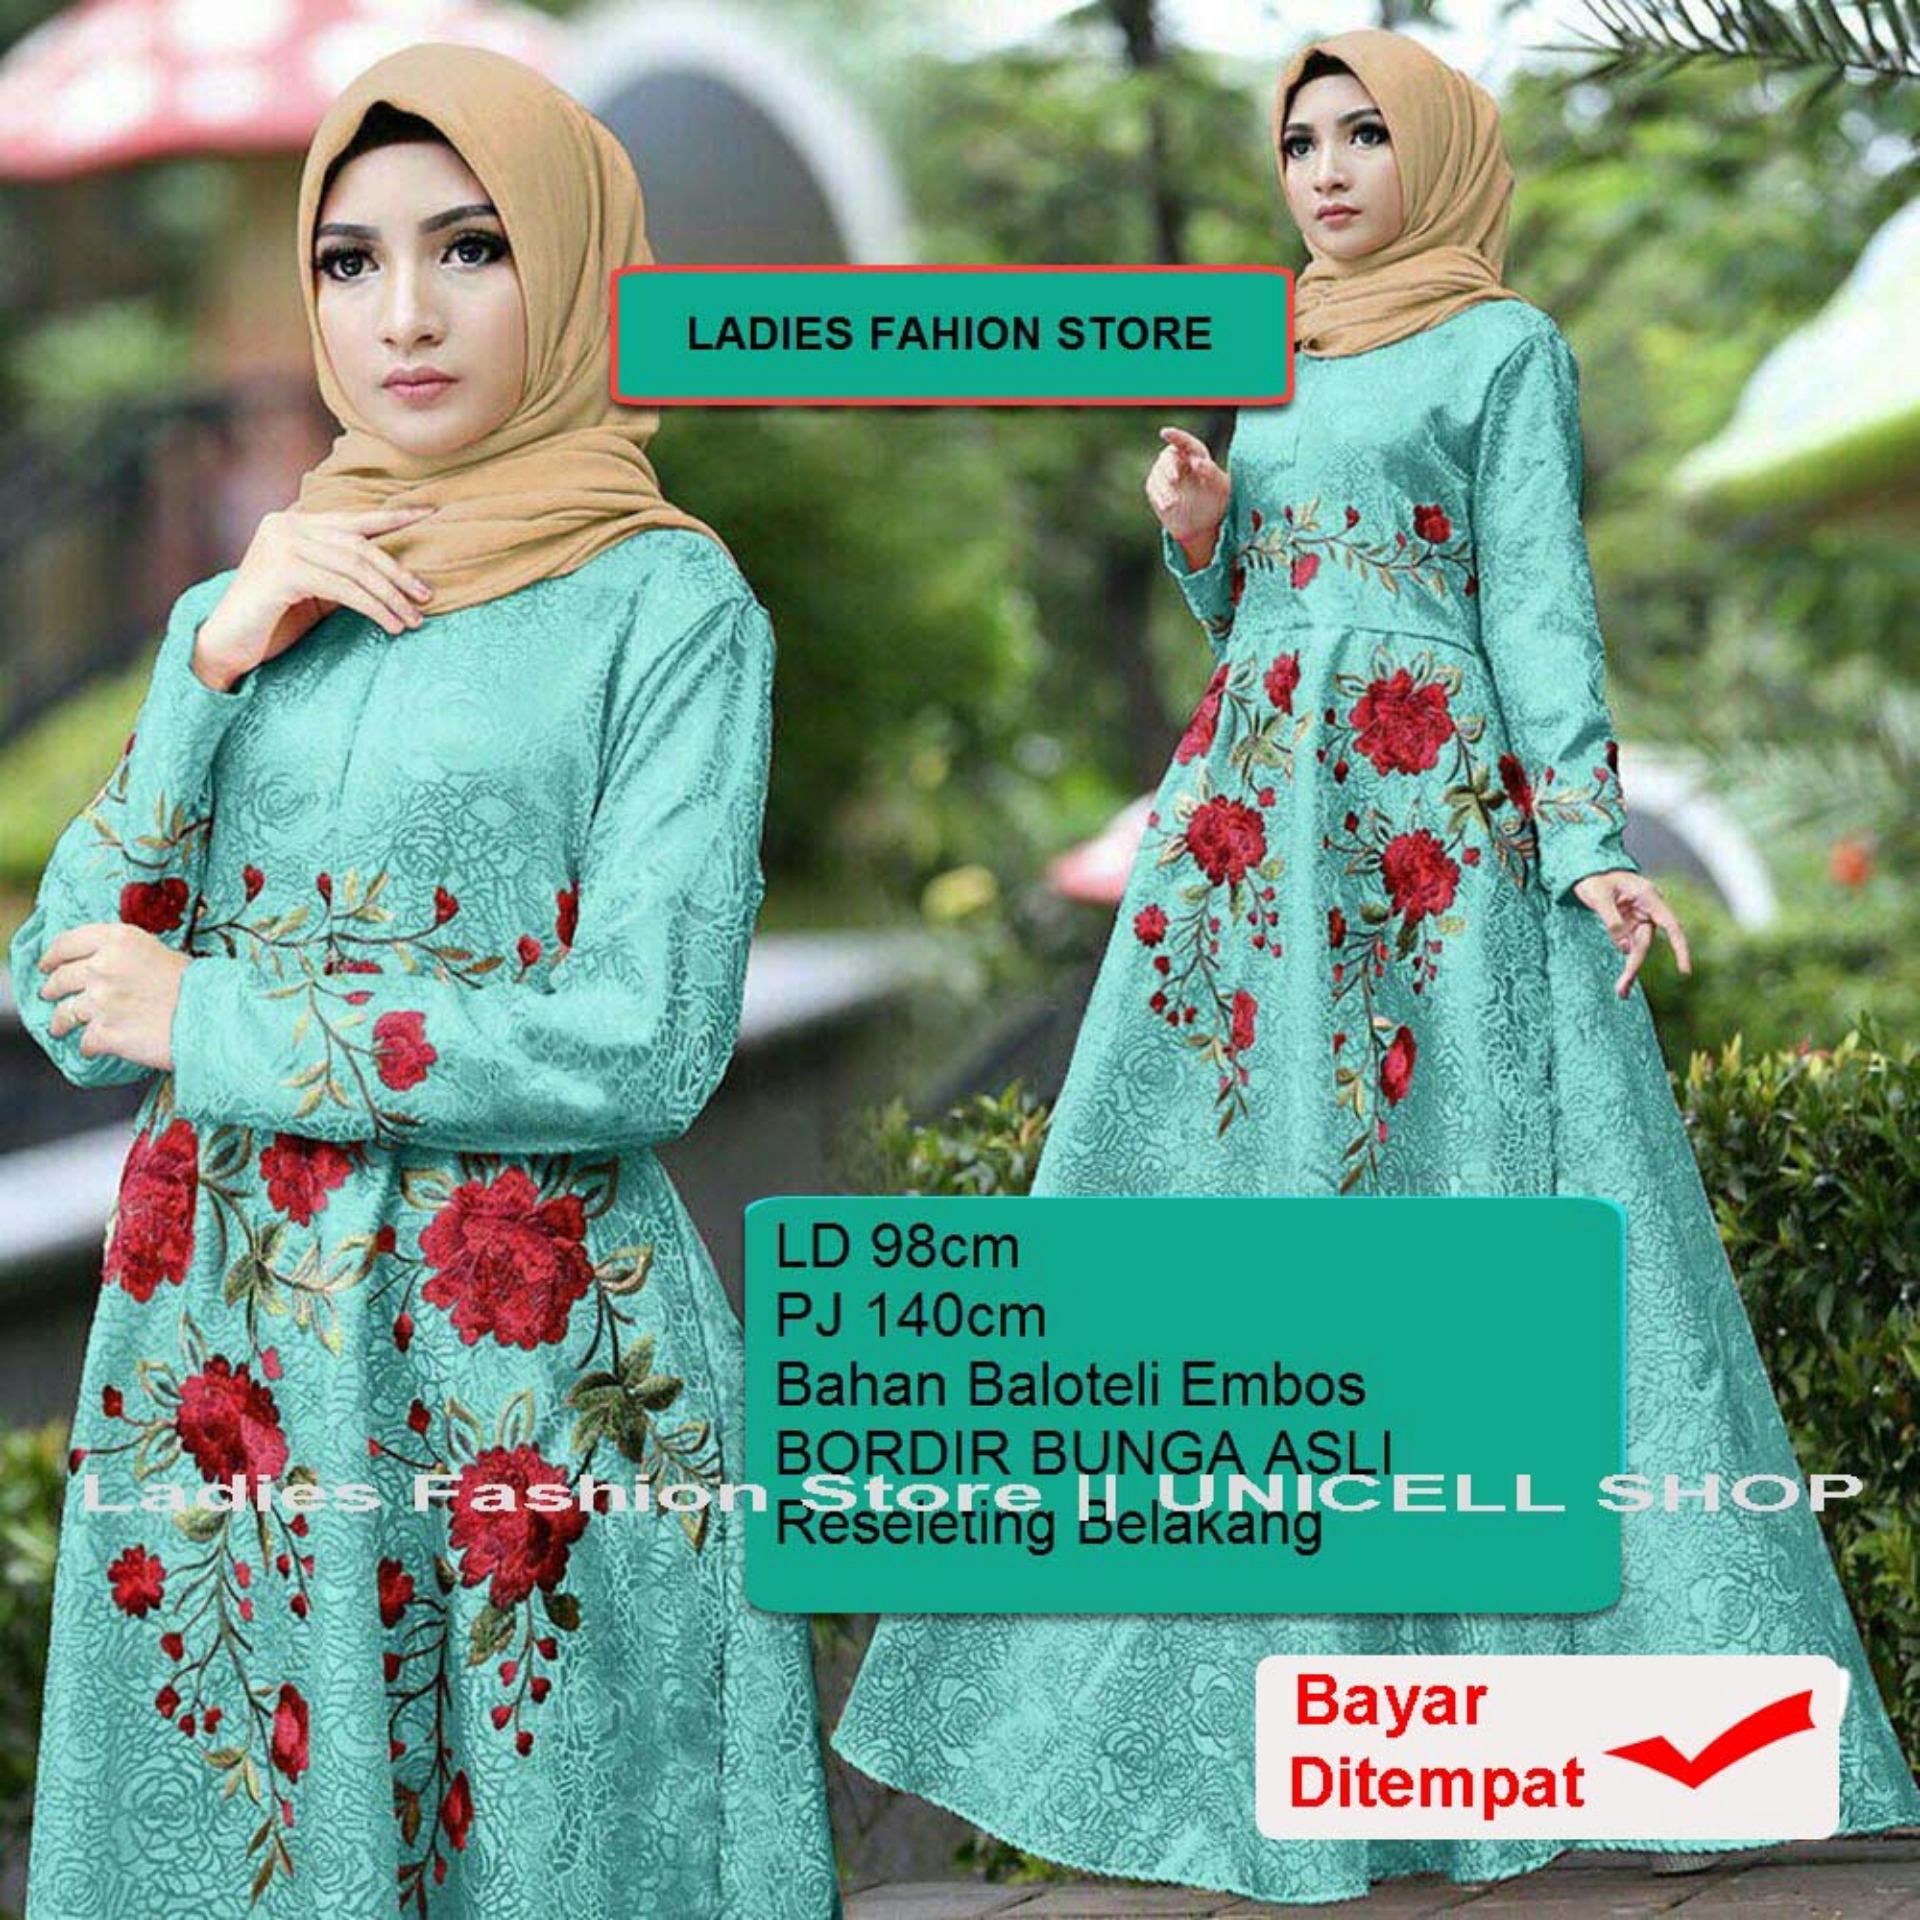 Baju Wanita Shop Dress Baju Gamis Muslim Iyana/ Set Terusan Maxi Hijab Syar'i/ Syari Simple Elegant / Baju Muslimah Wanita / Kebaya Modern Baloteli Tanpa Pasmina (anaay) SS - Tosca / Gaun Pesta